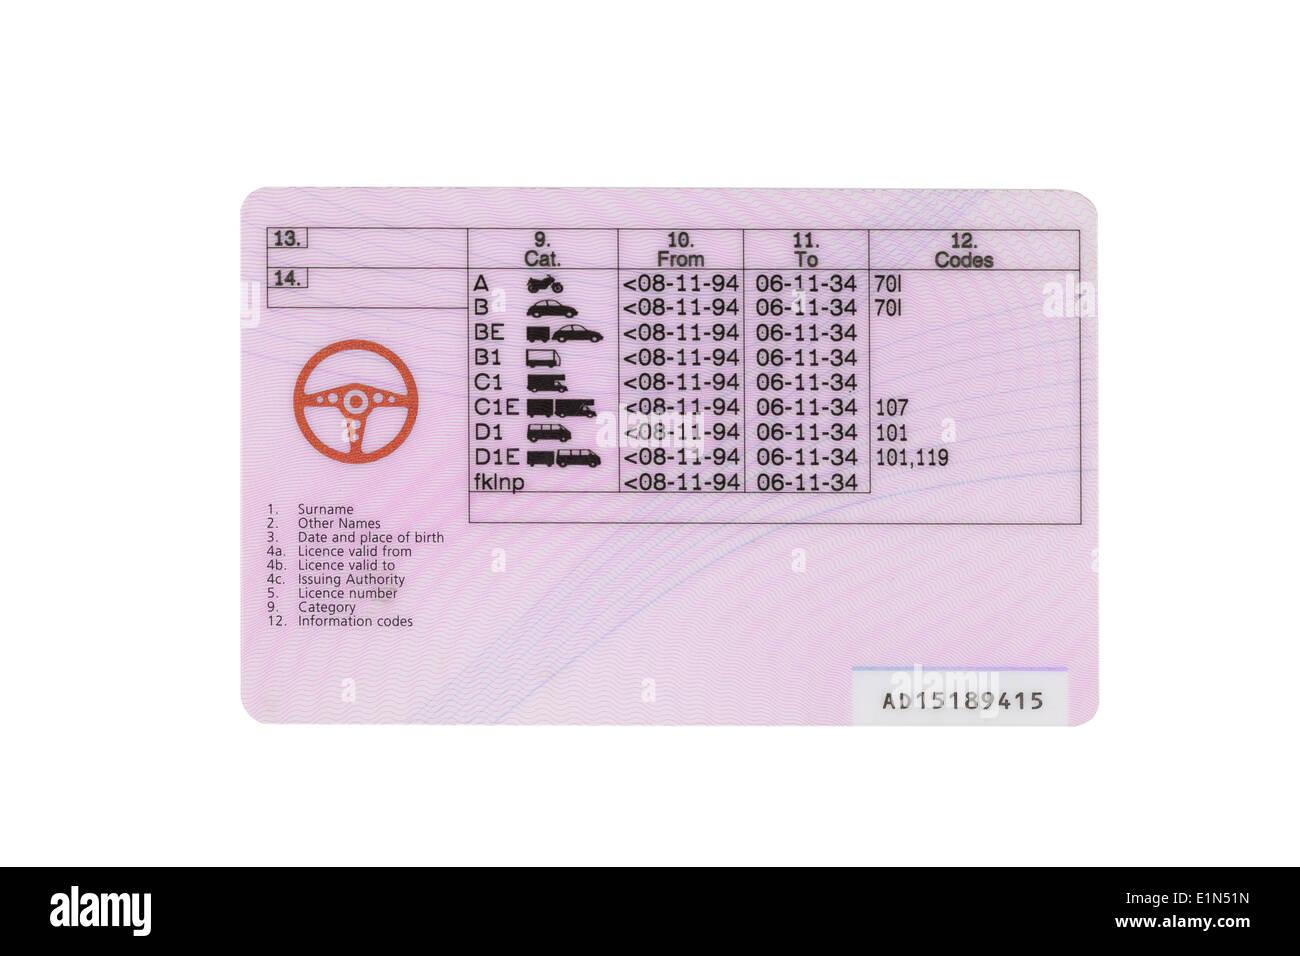 UK driving licence back side - Stock Image